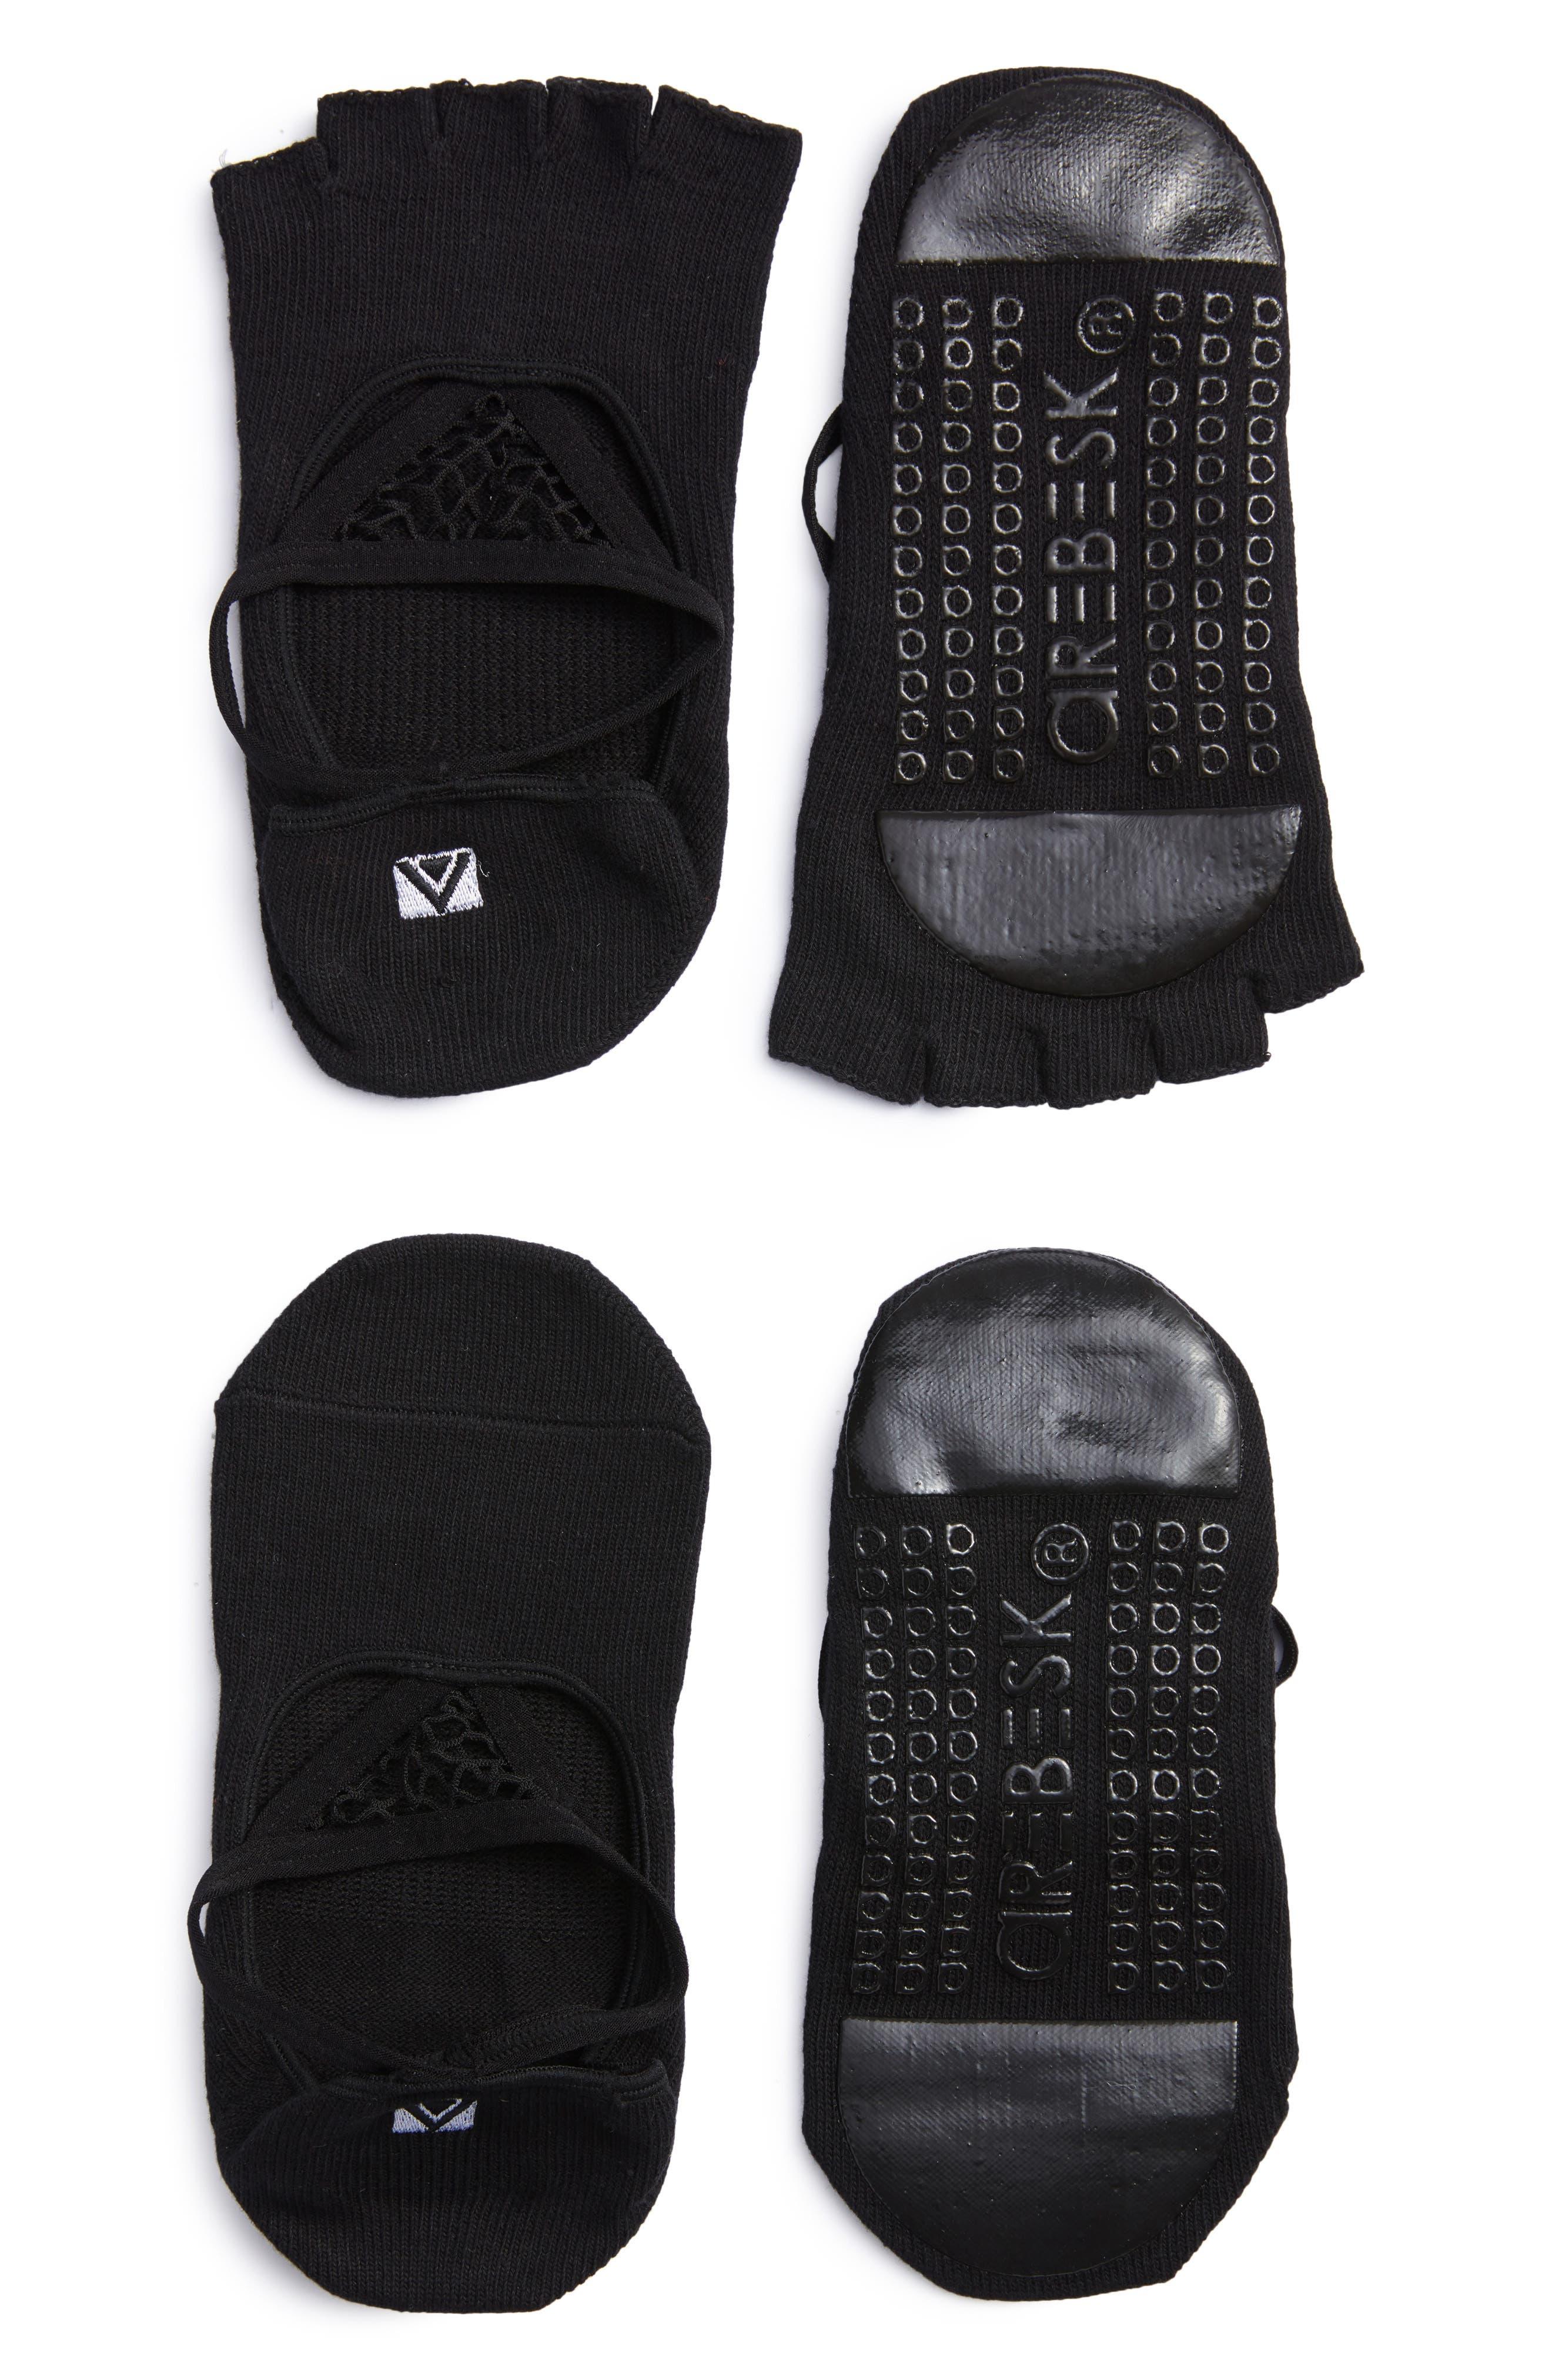 Muse Assorted 2-Pack No-Slip Open Toe & Closed Toe Socks